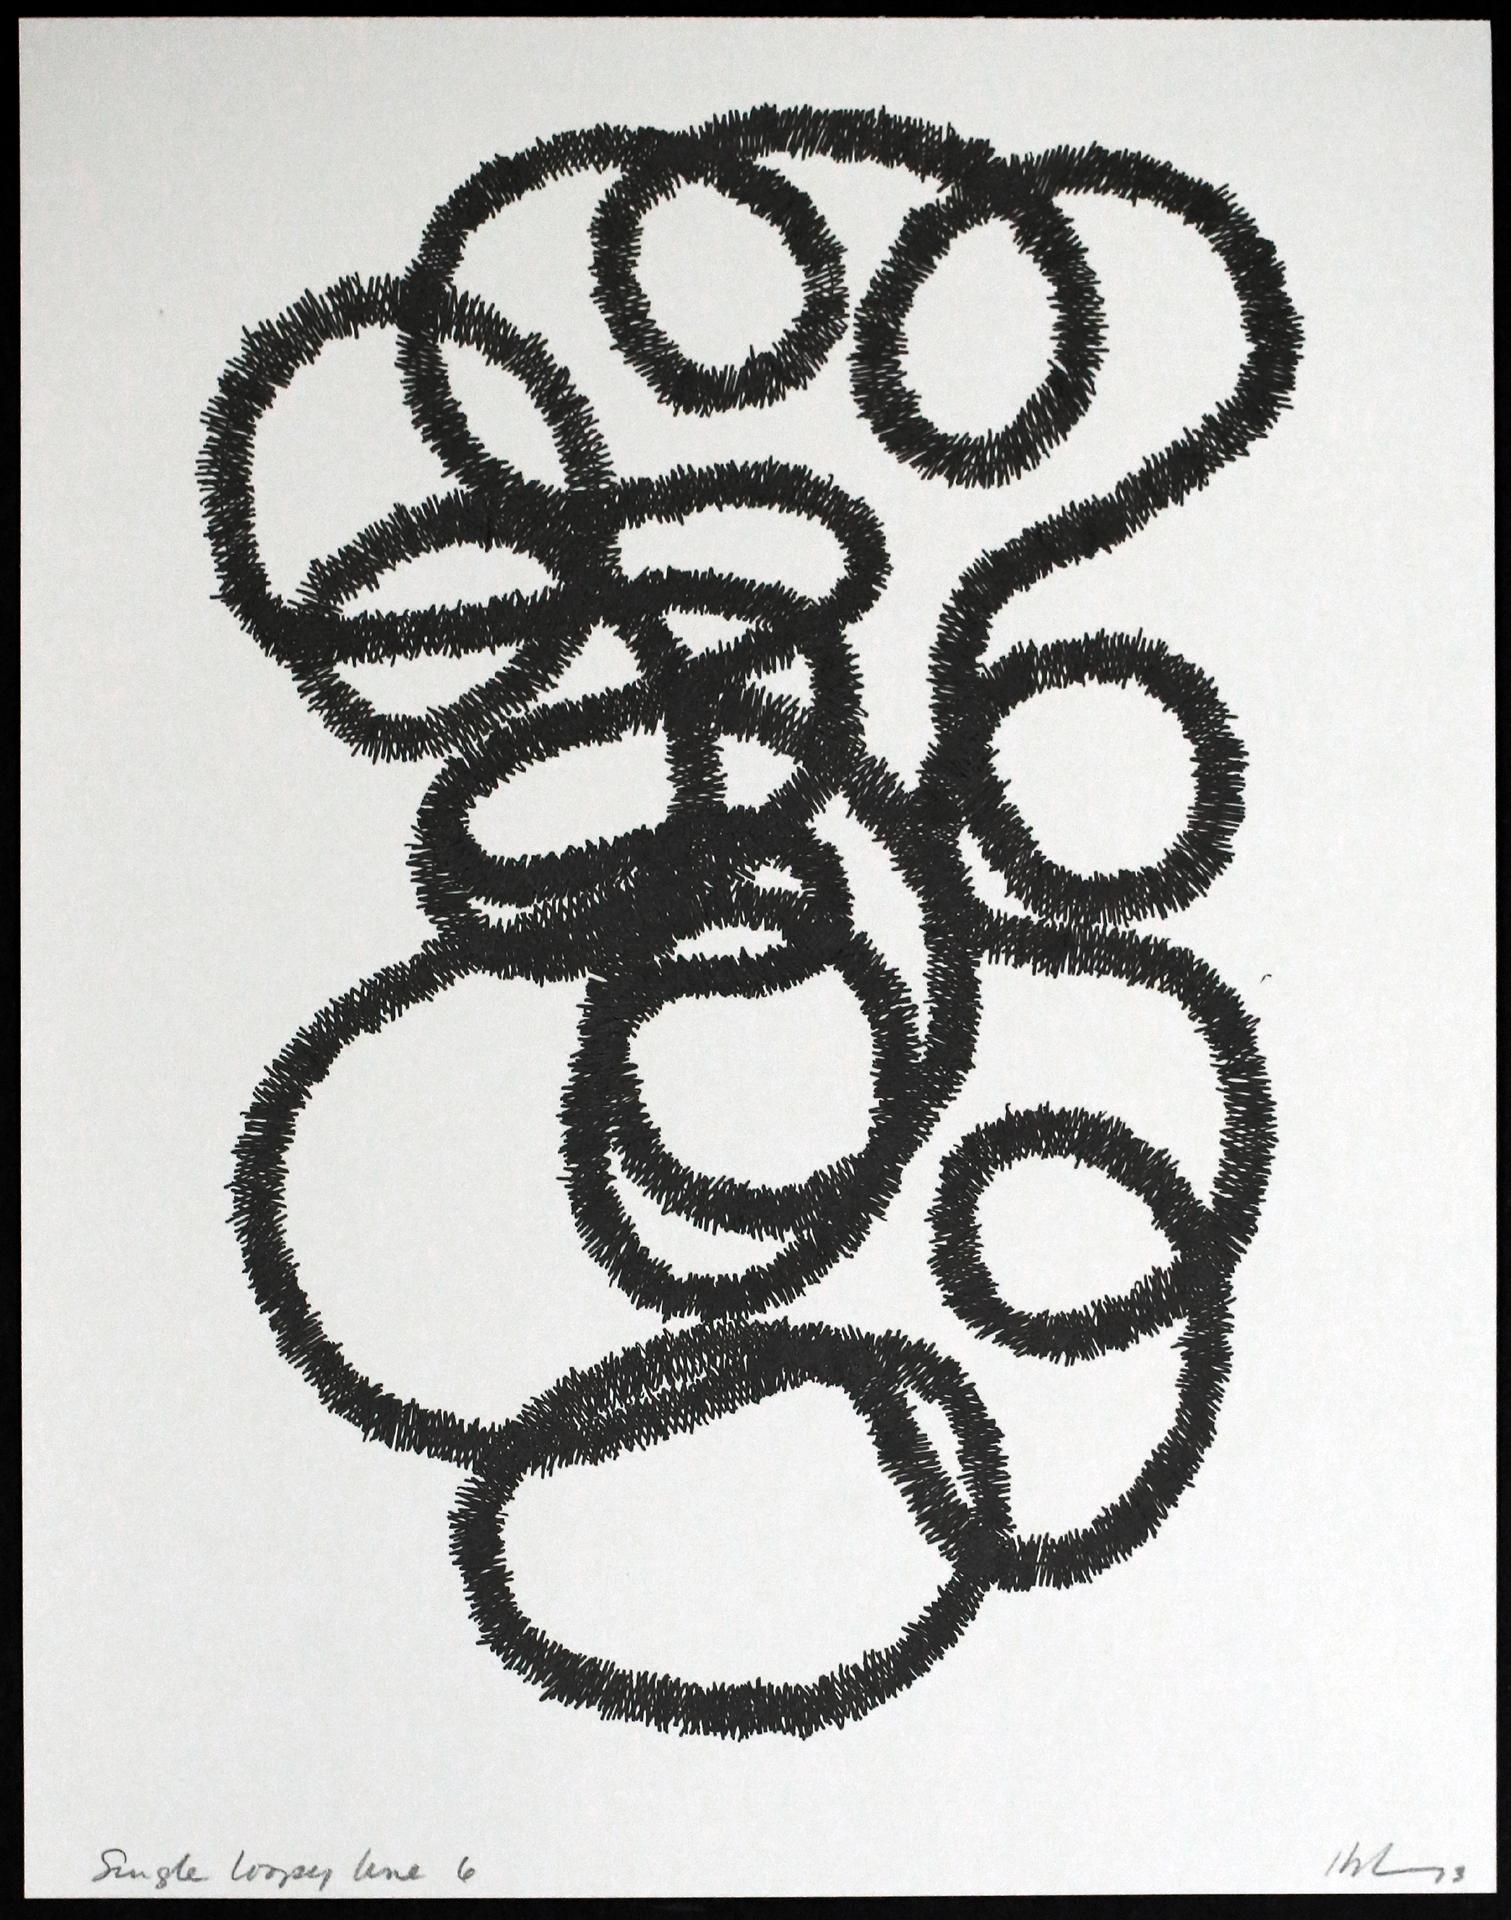 single-loopy-line-6-2013-ink-on-rag-paper-14-in-h-x-11-in-w-mcc